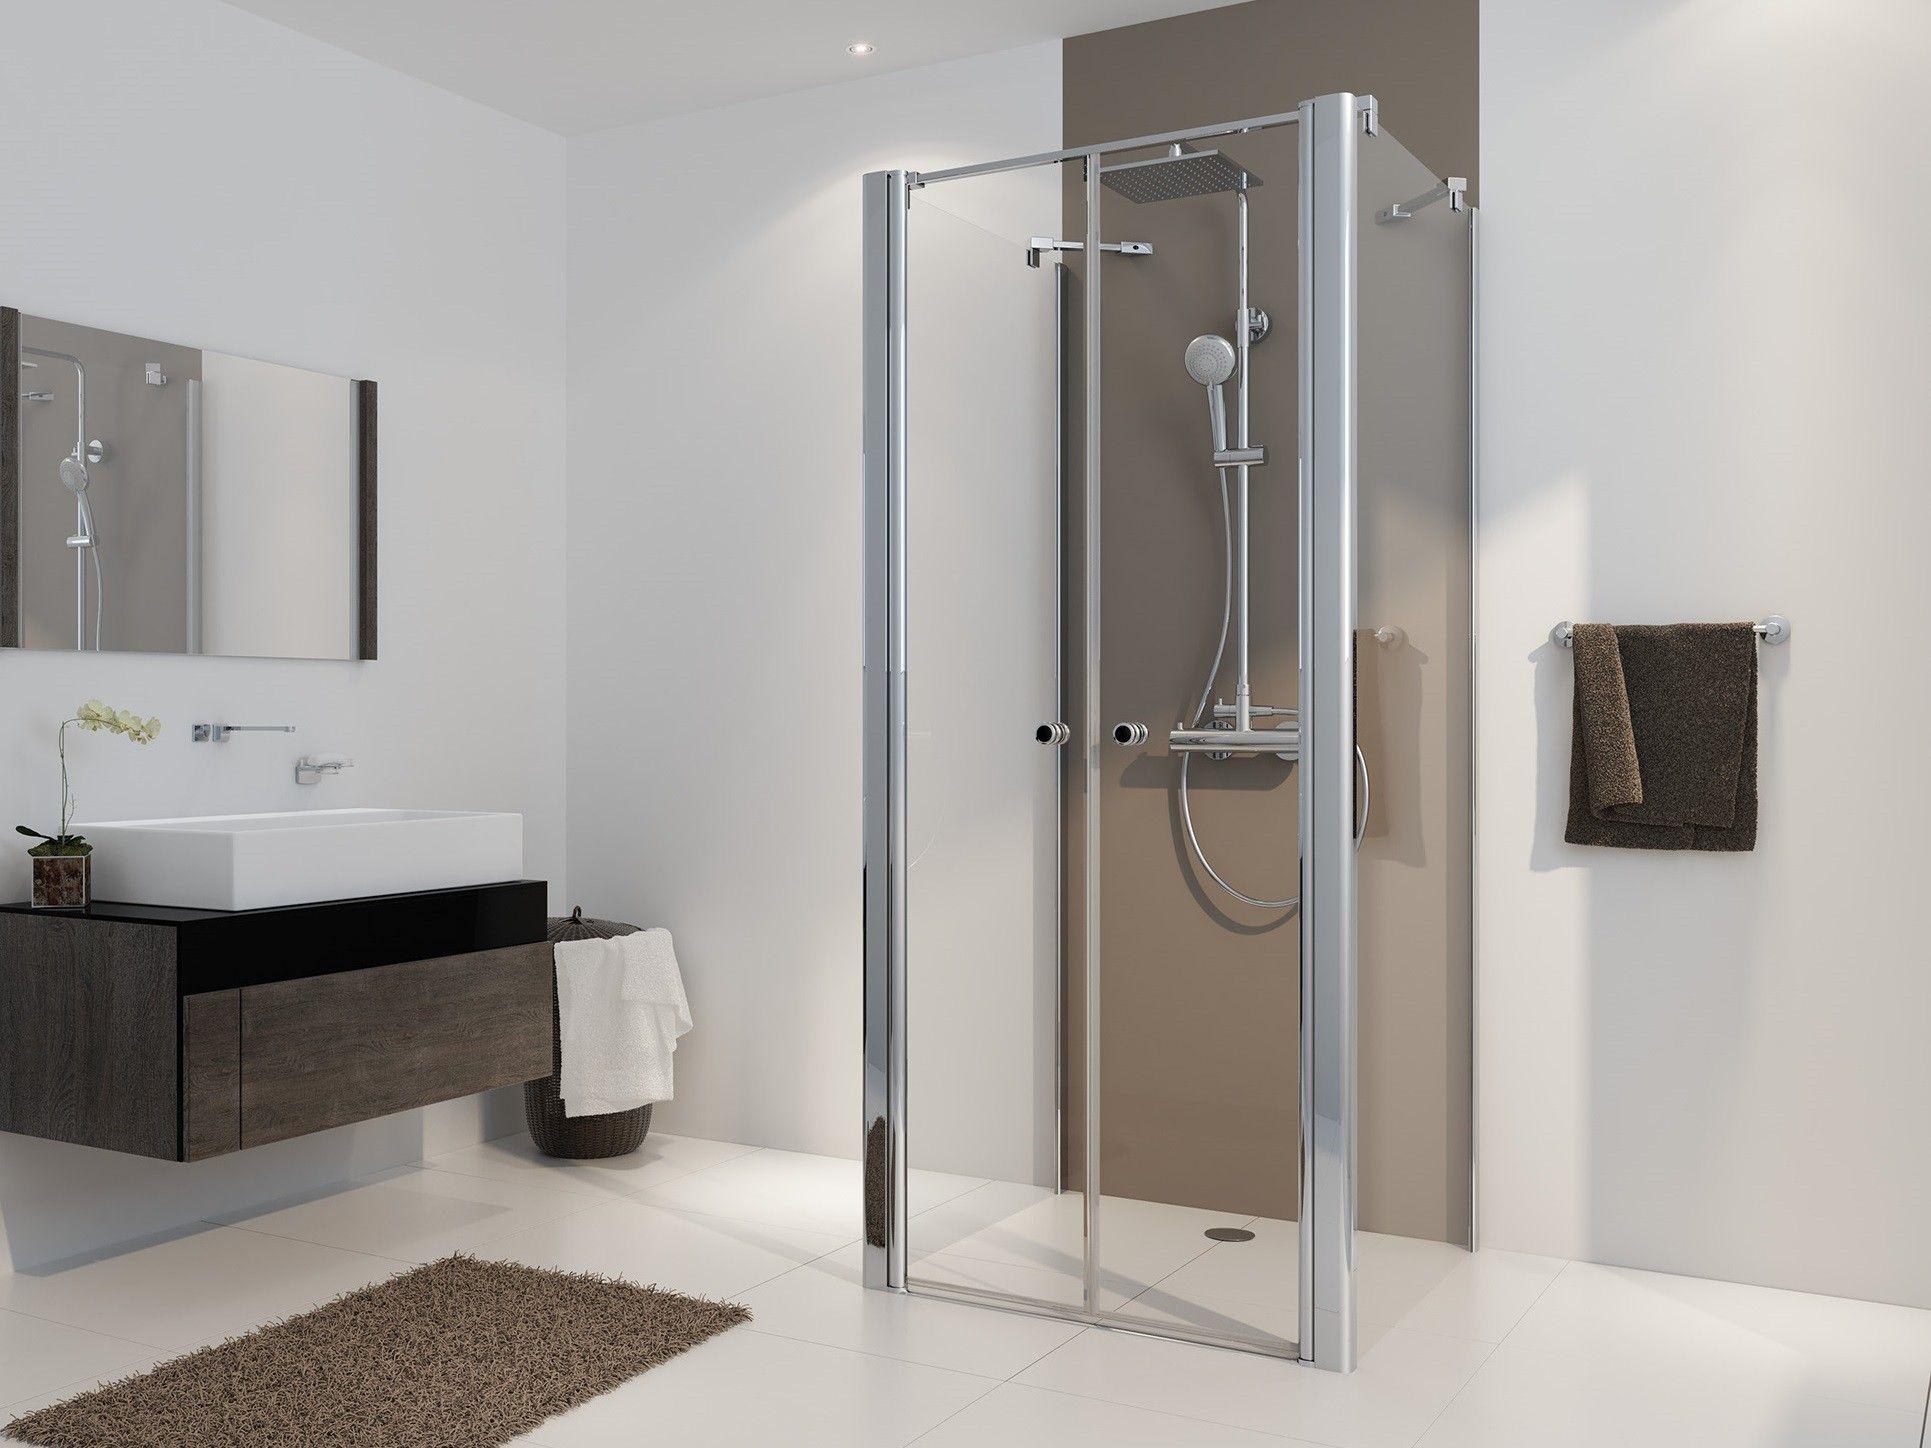 Duschkabine U Form Pendeltur Bad Design Heizung Duschkabine U Form Falttur Dusche Duschabtrennung